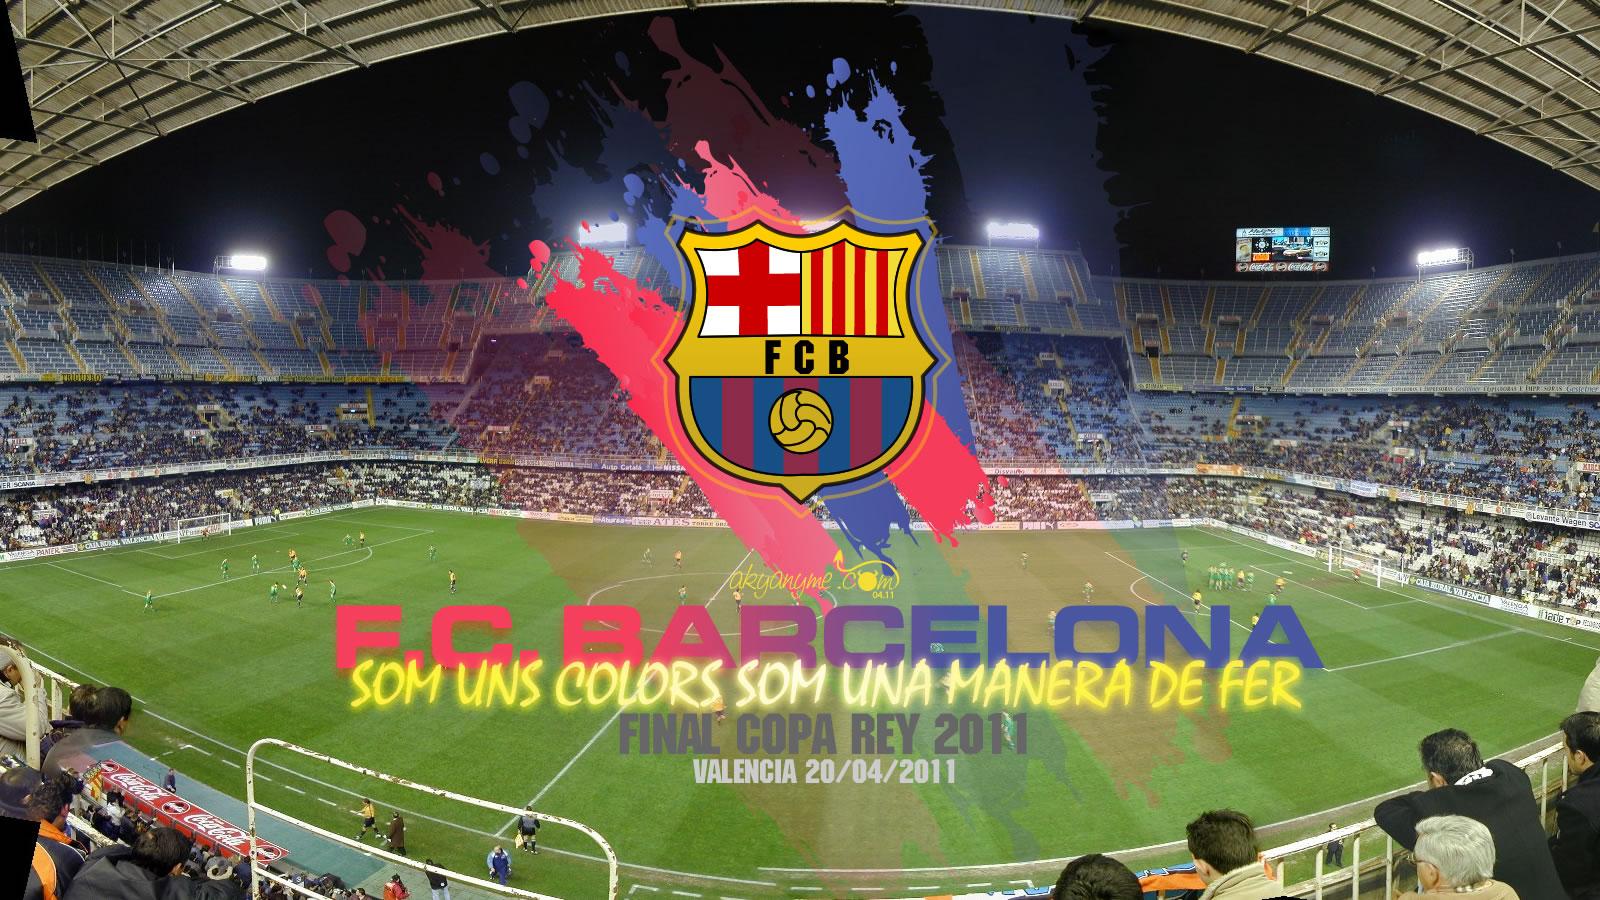 Imagenes del clasico barcelona vs real madrid de hoy for Real madrid sevilla hoy